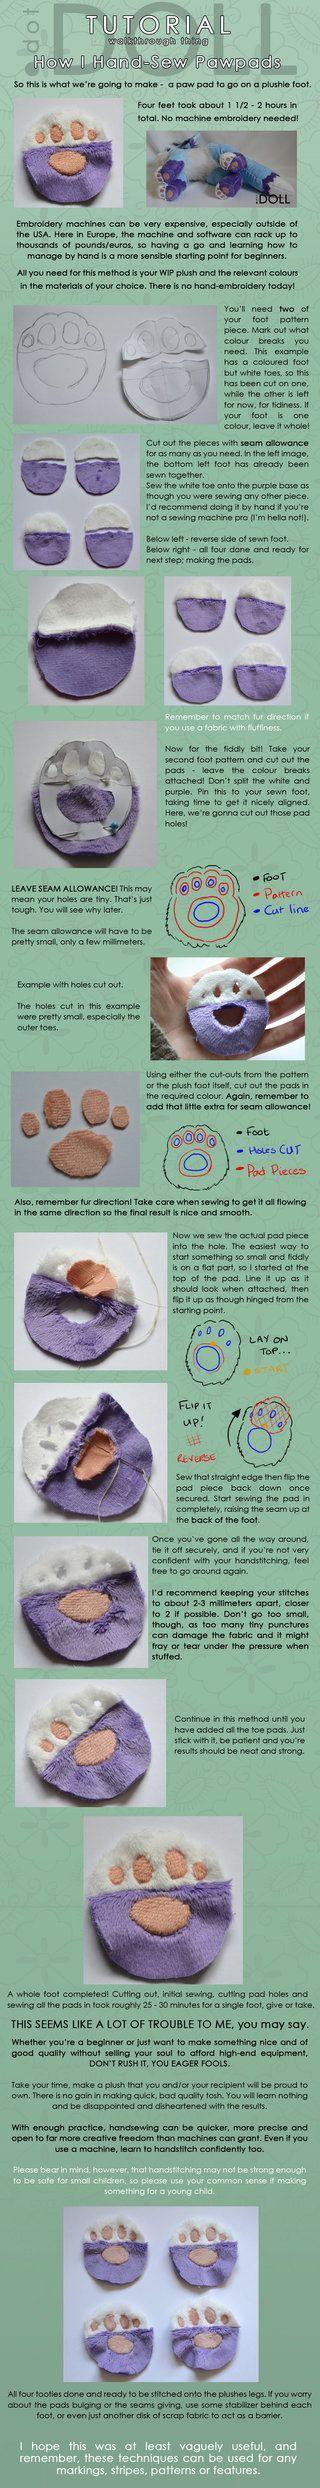 How I hand stitch Paw Pads http://www.deviantart.com/art/How-I-hand-stitch-Paw-Pads-479560630